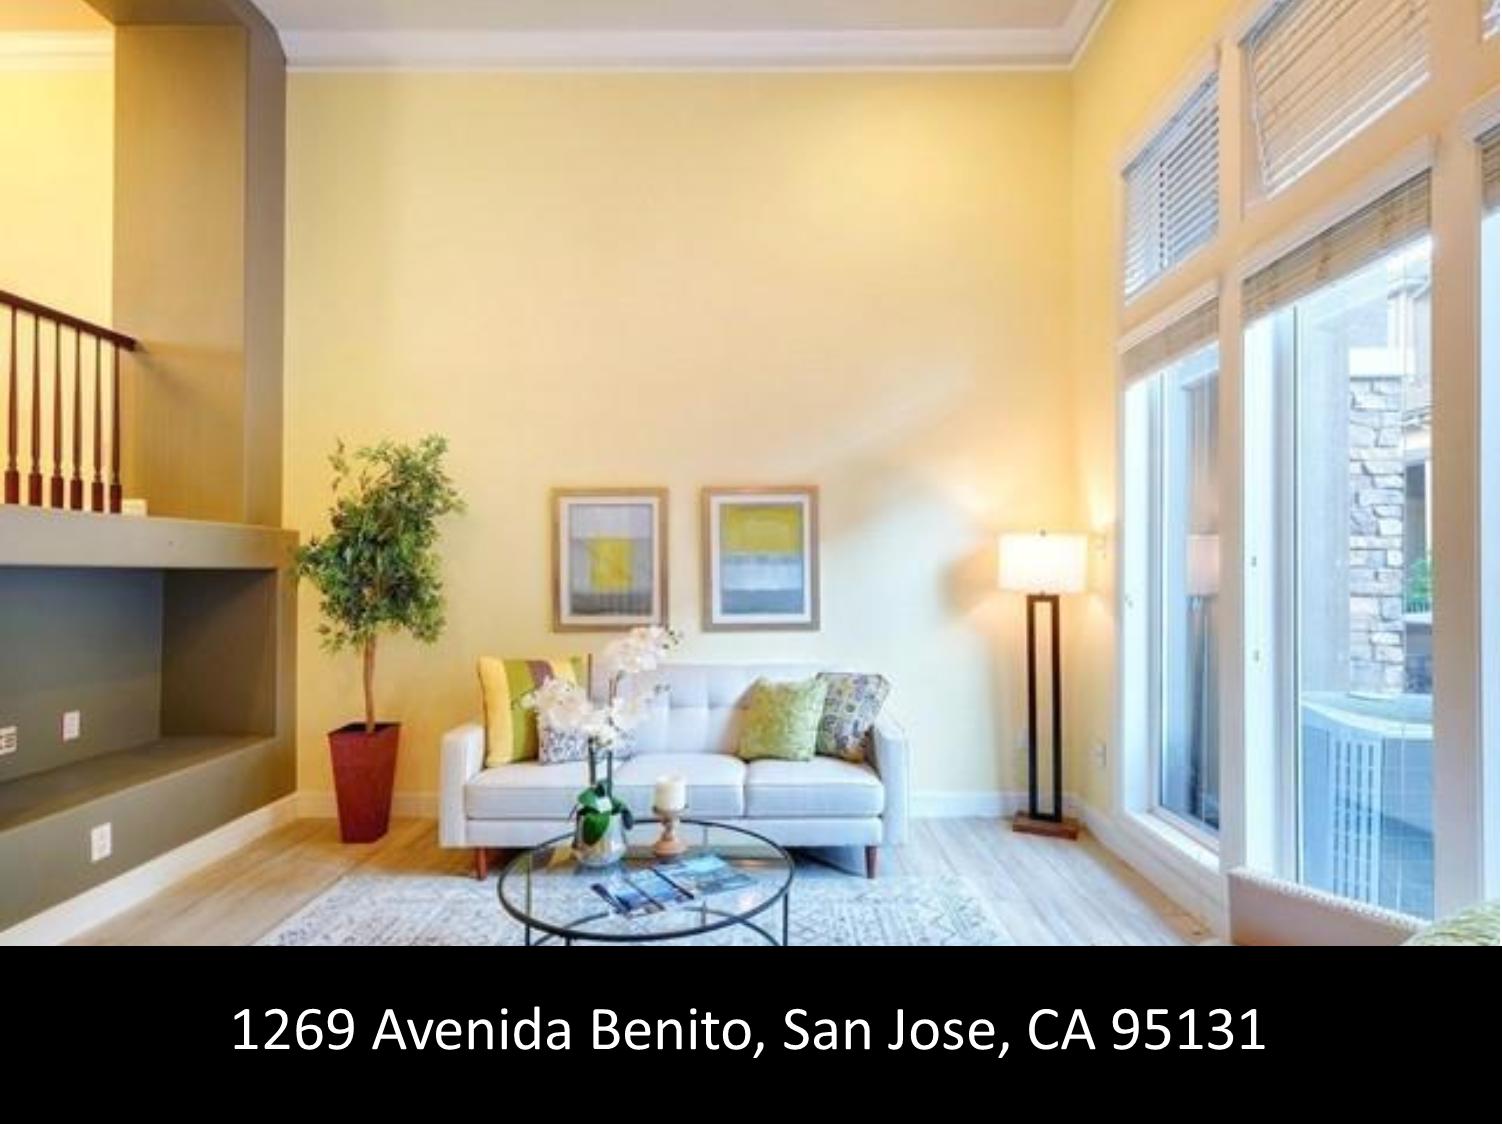 1269 Avenida Benito, San Jose